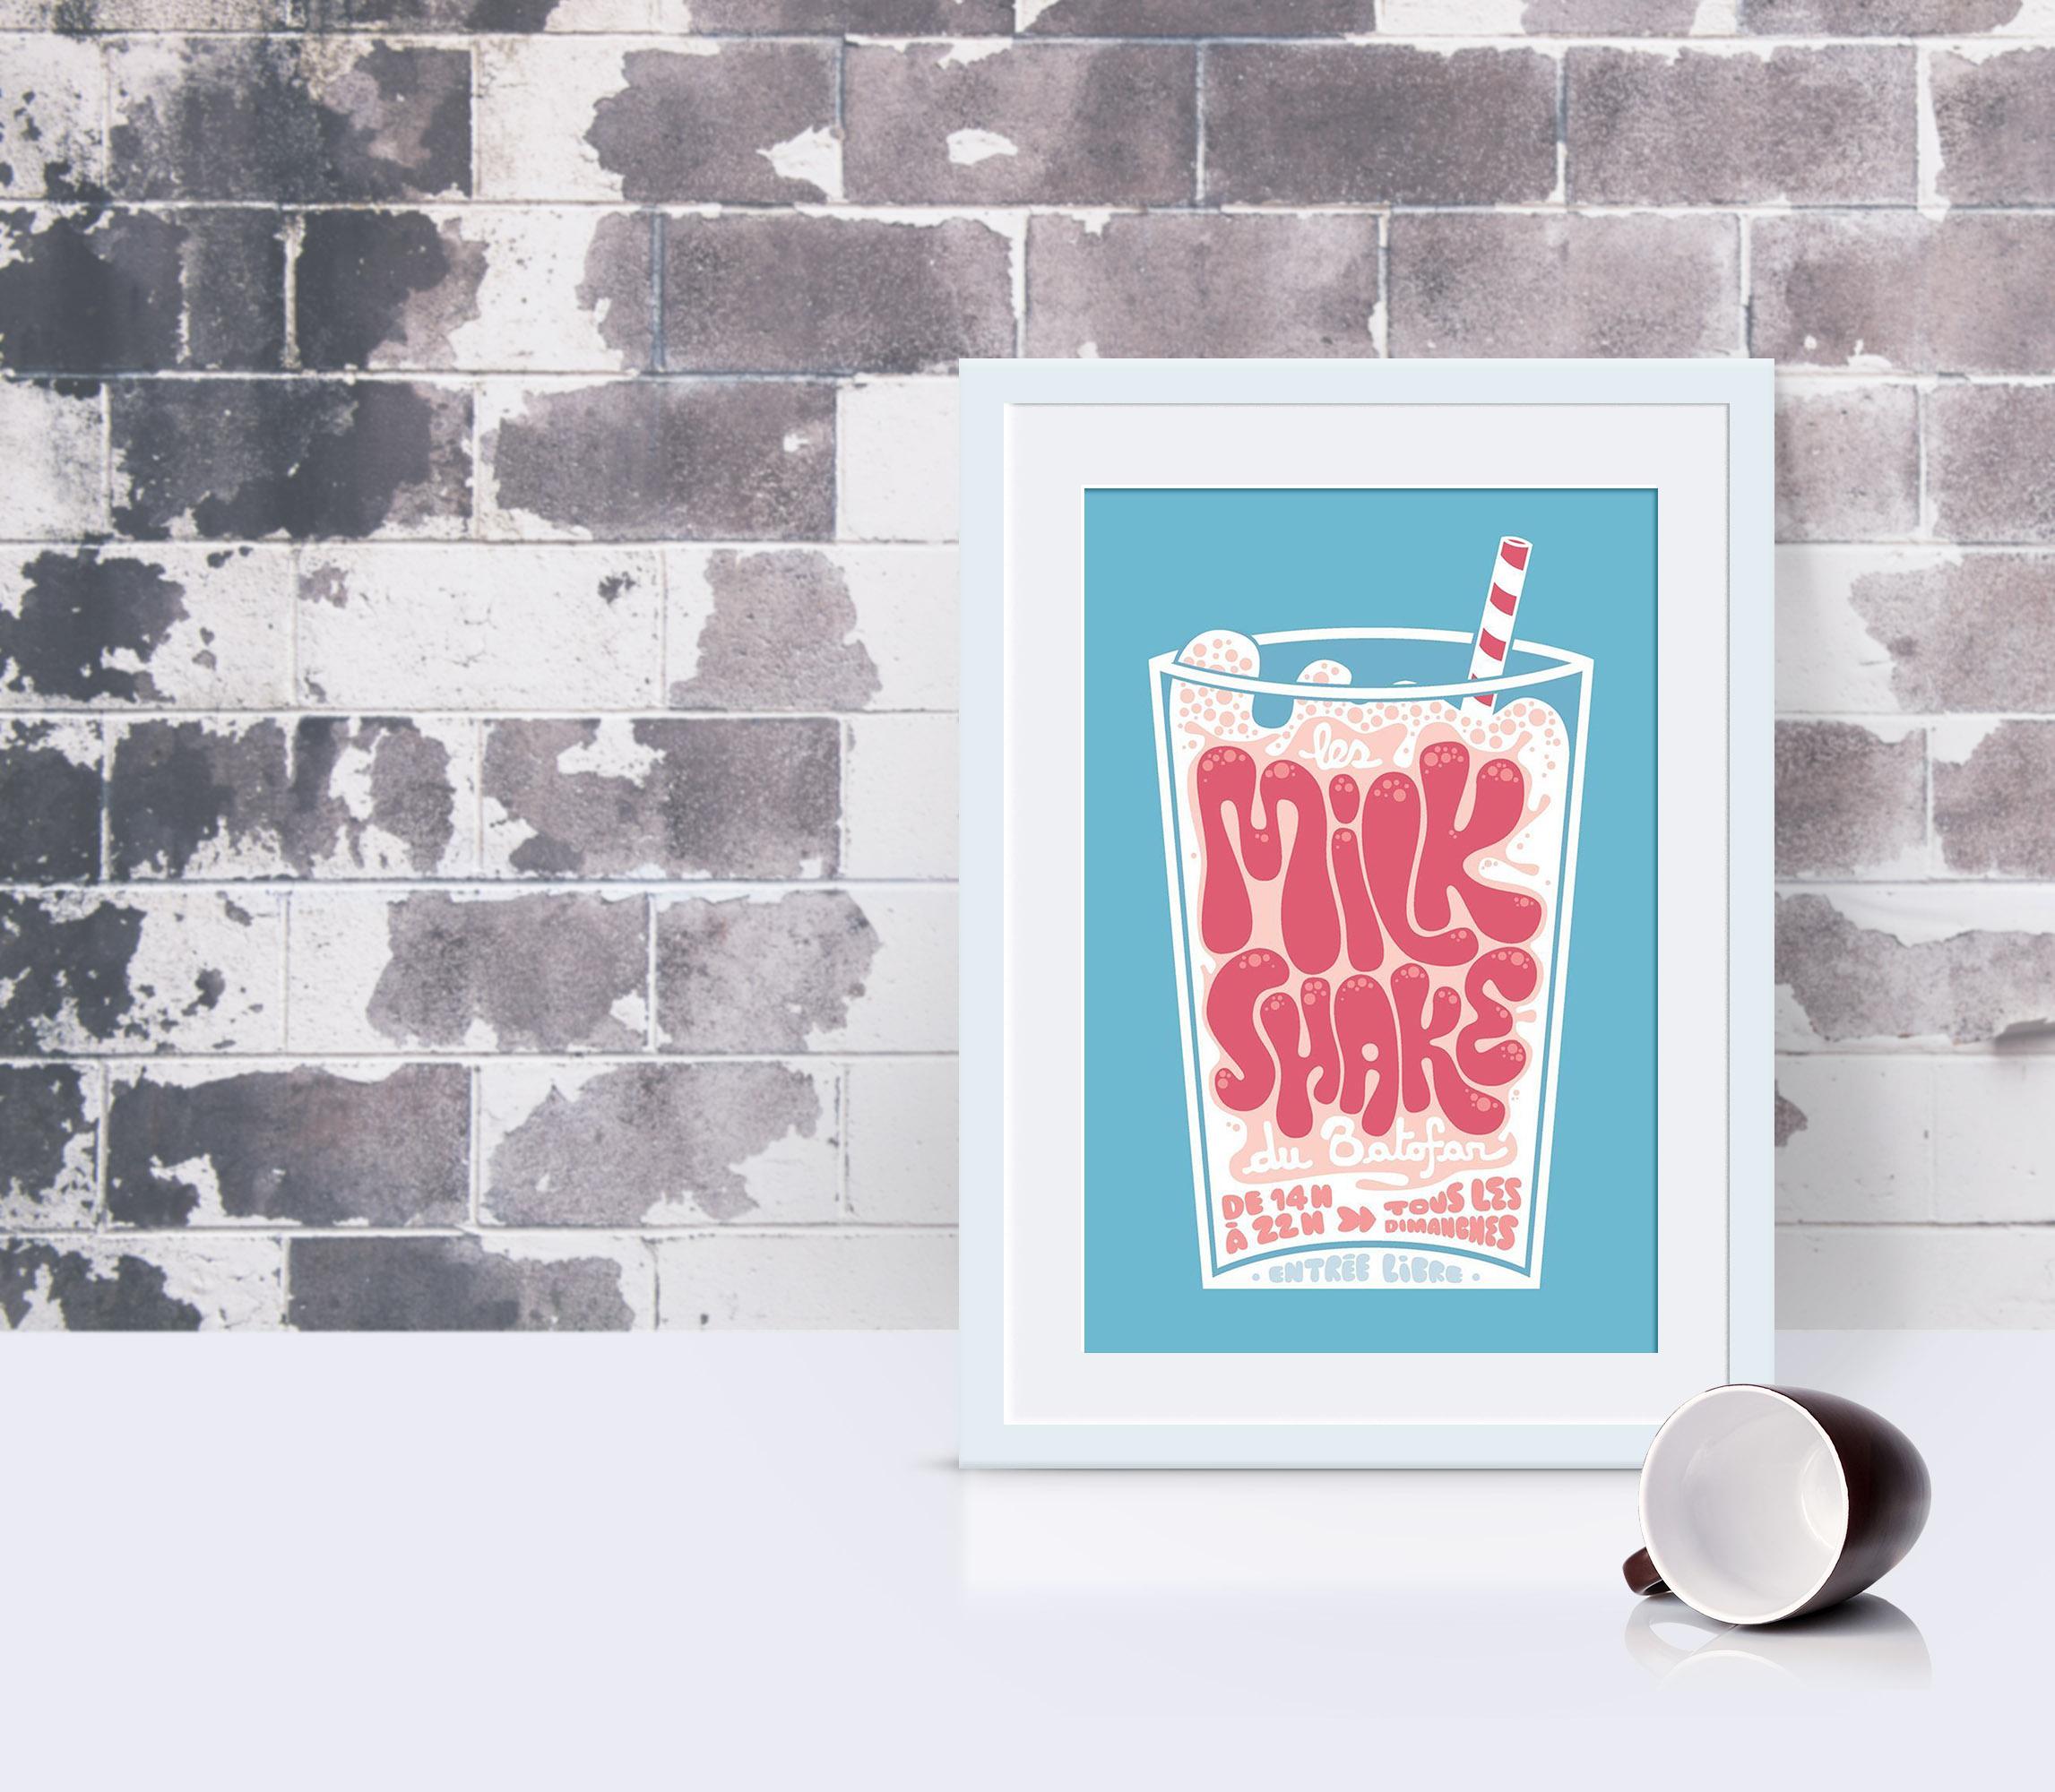 Milkshake Du Batofar Creative Event Poster Example